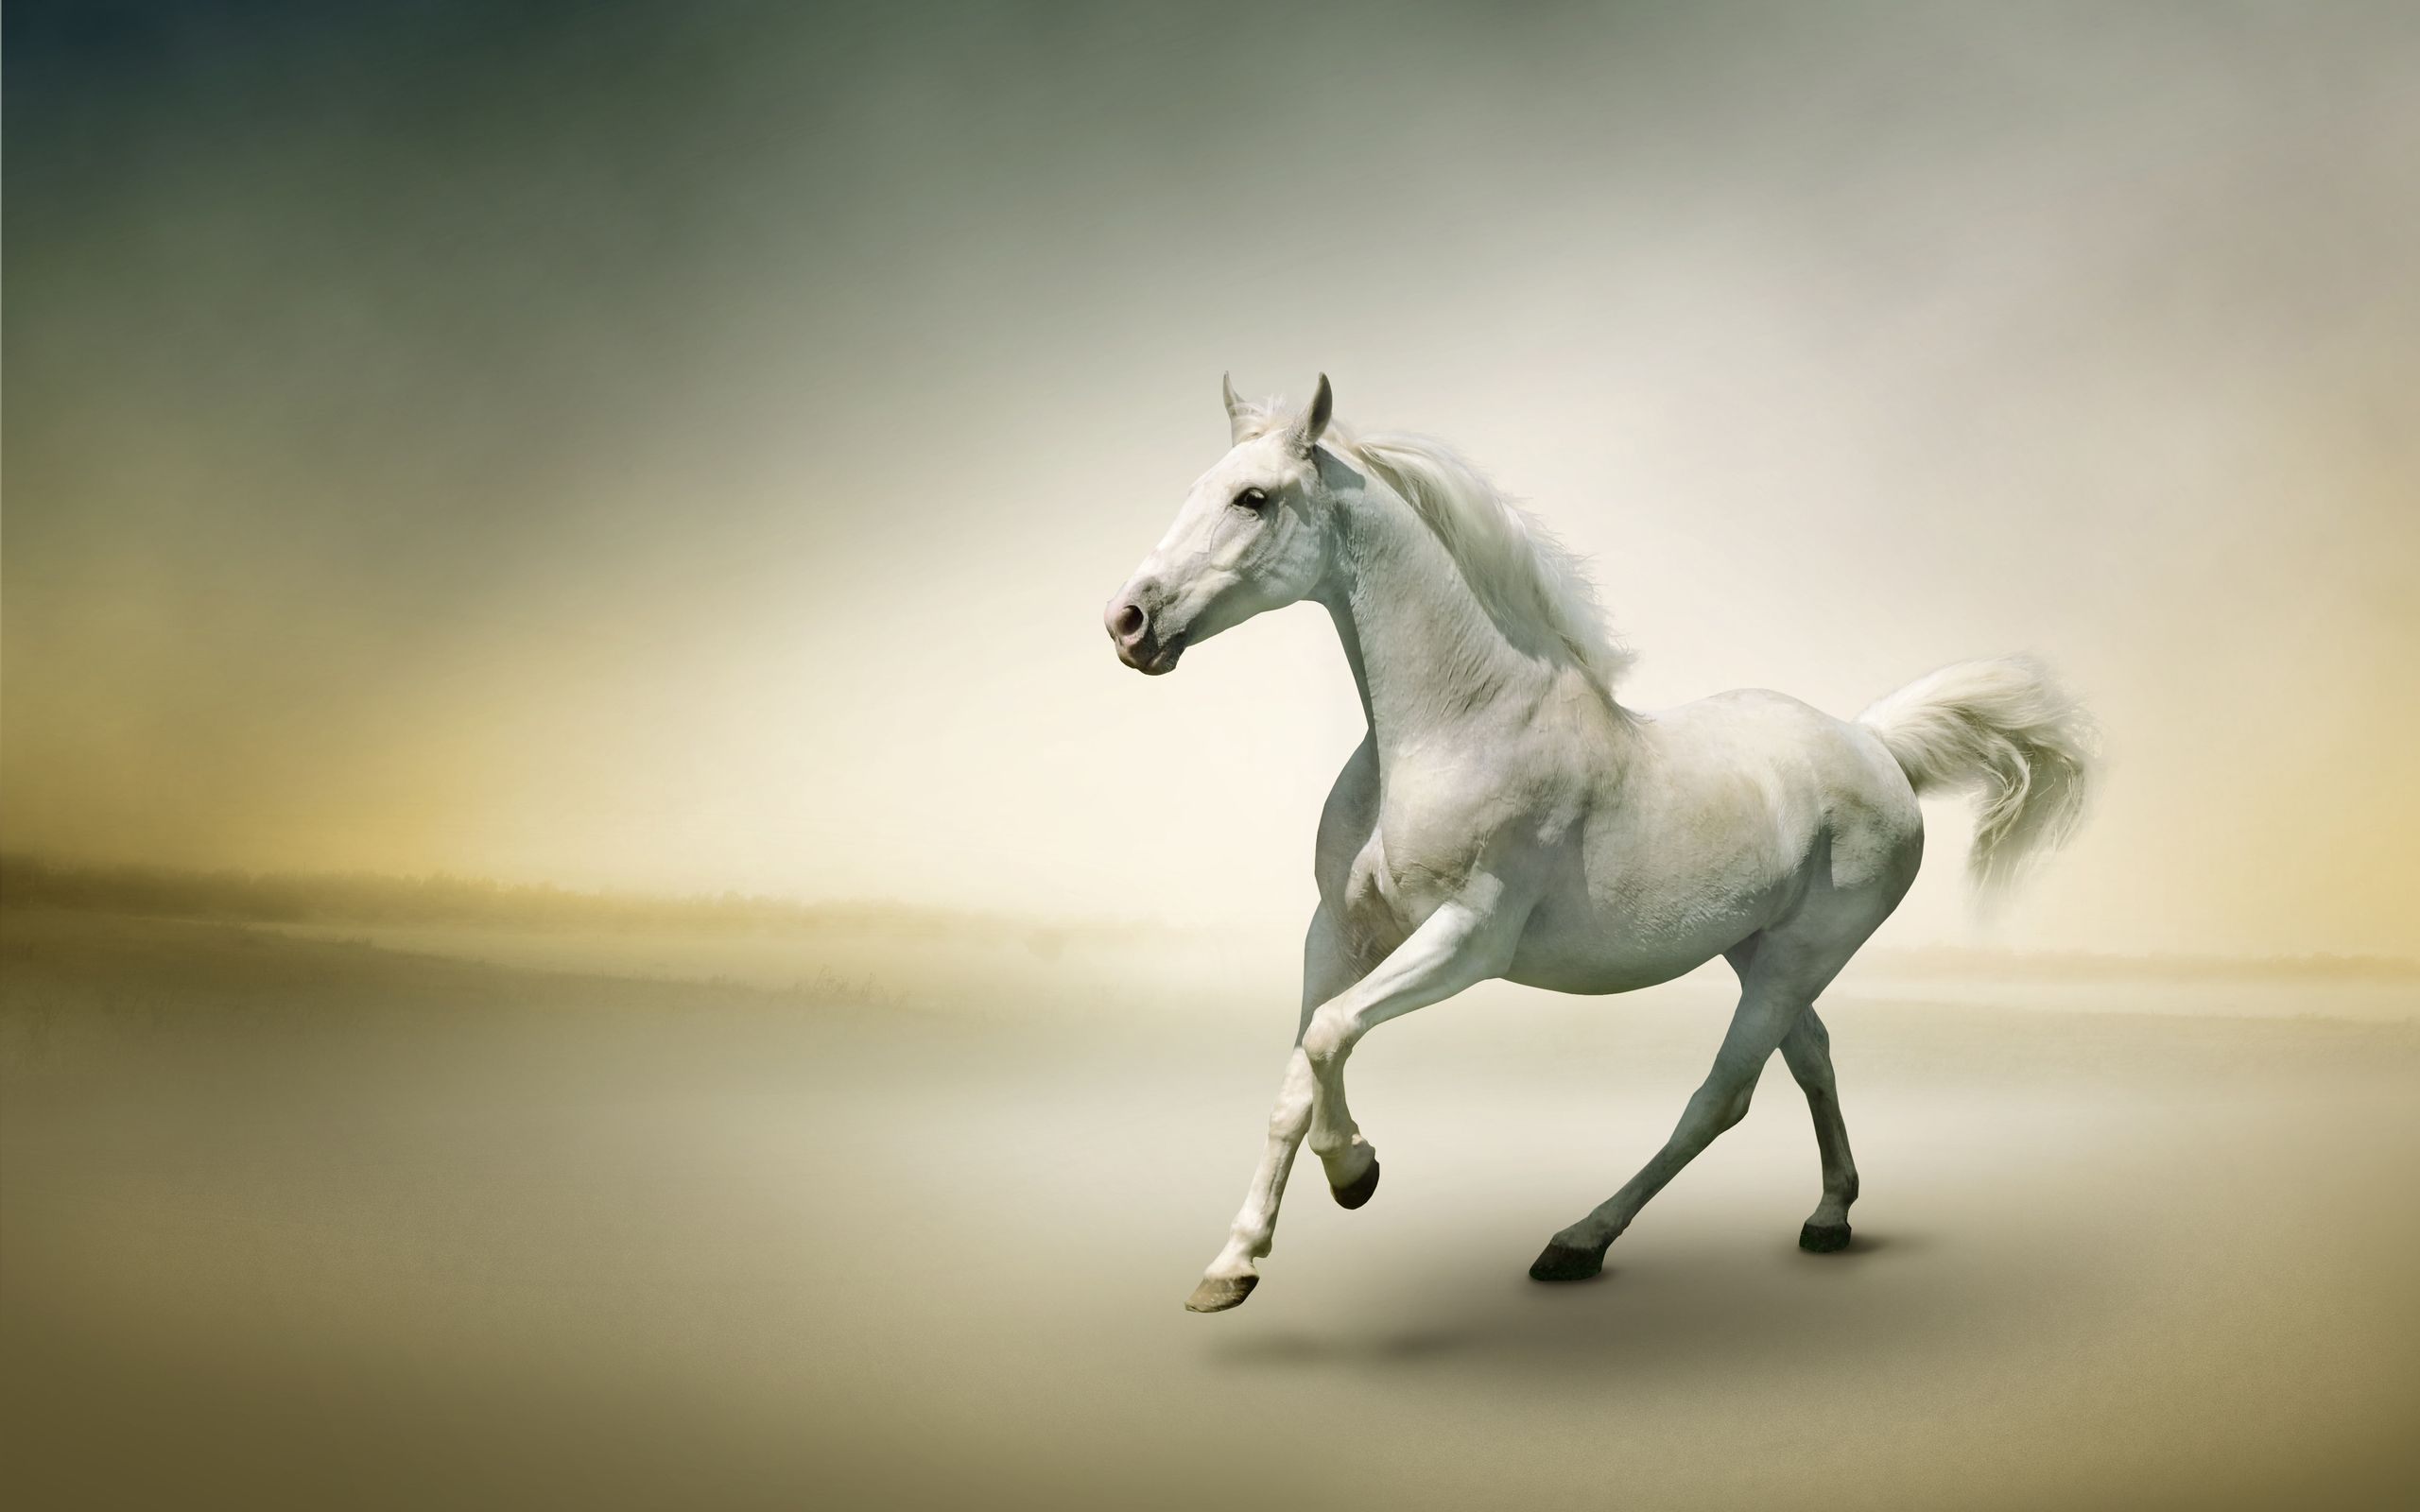 Download Wallpaper Horse High Definition - 9ef32bce49a56eec8711d0c3e2ea8141  Image_223488.jpg